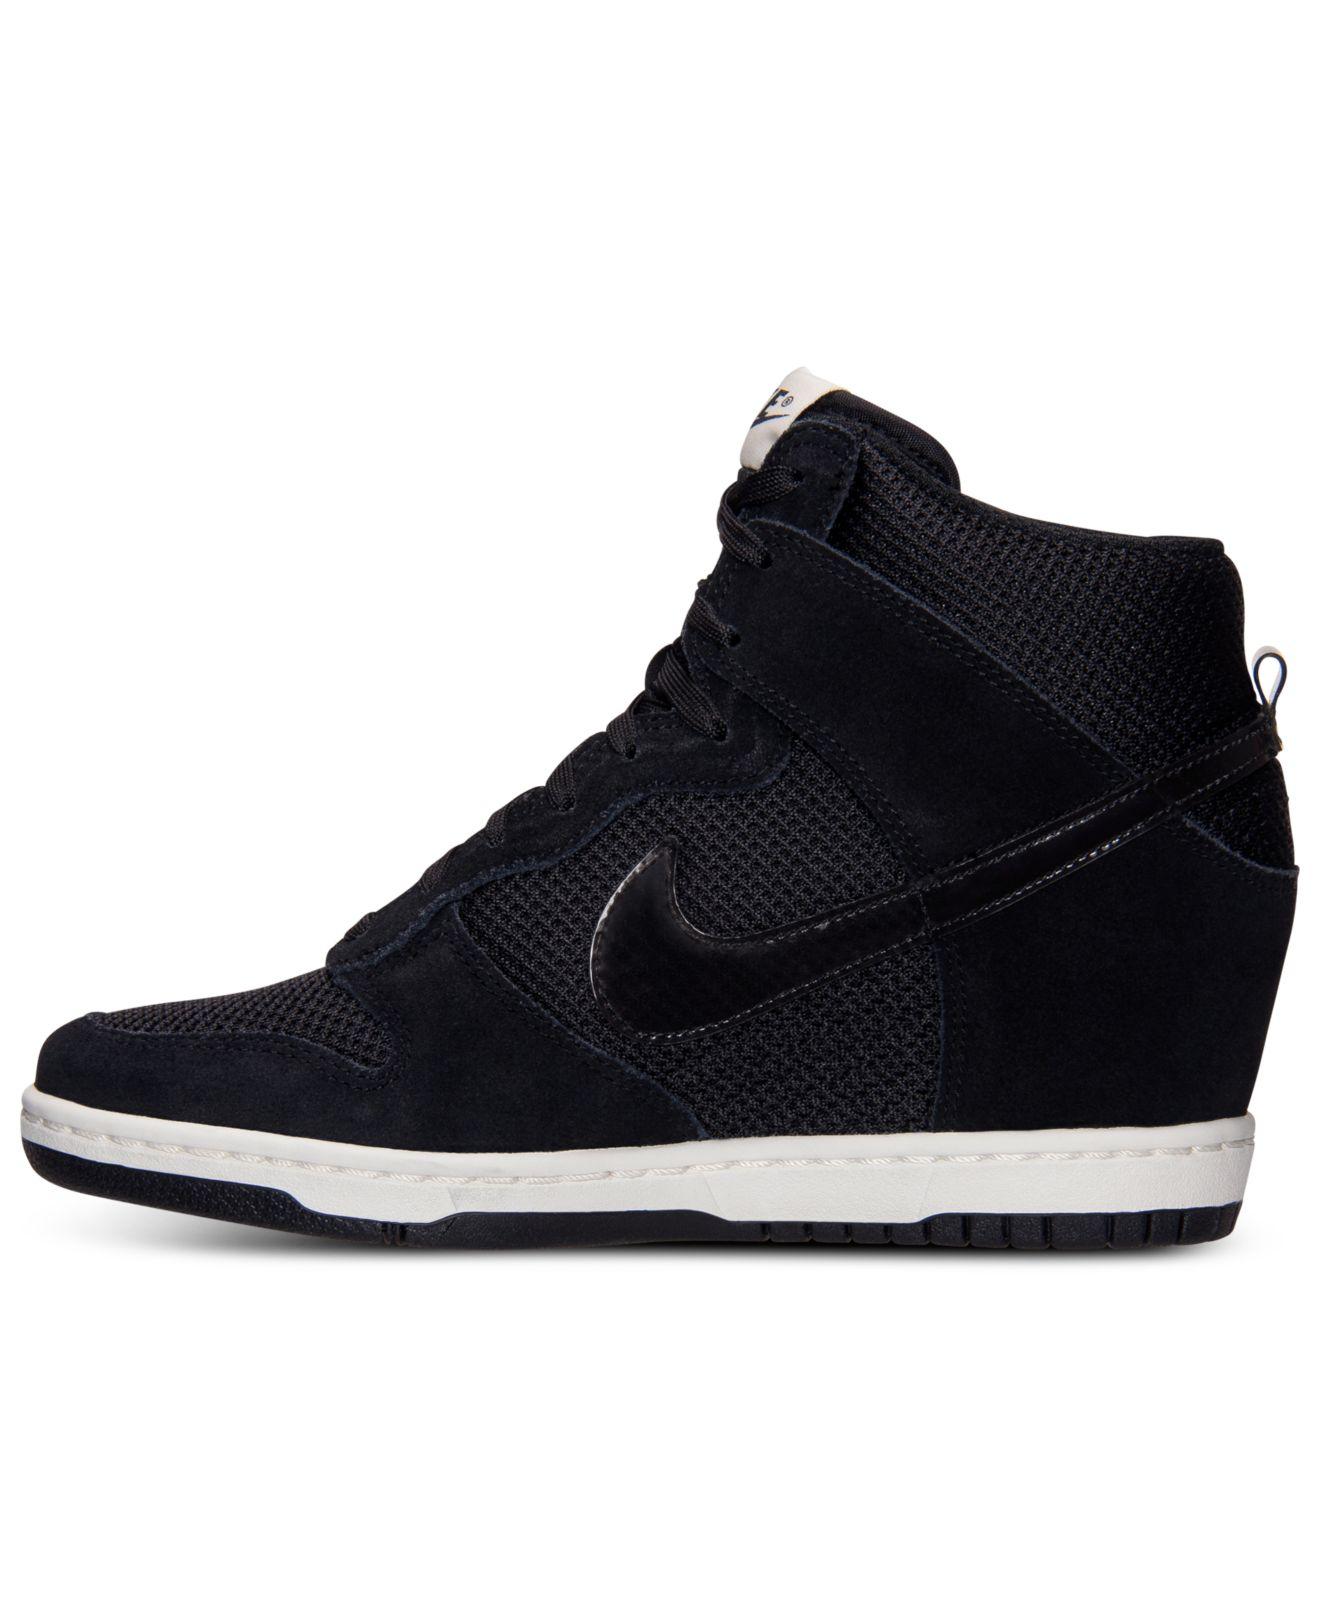 5b65cf5cff96 Lyst - Nike Women S Dunk Sky Hi Essential Casual Sneakers From ...